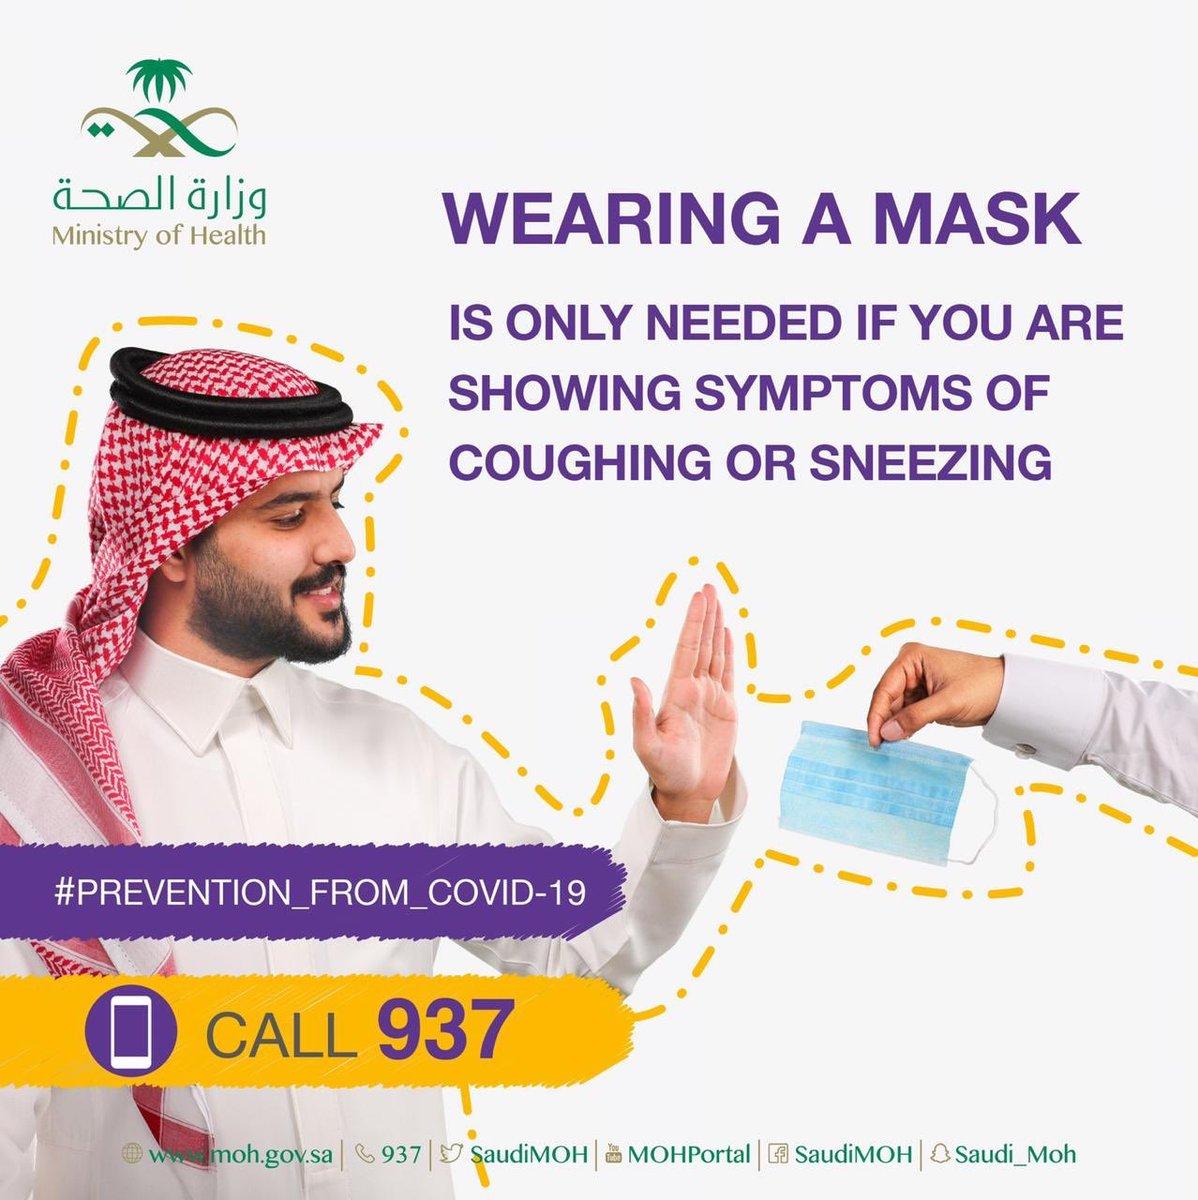 When should you wear a face mask?  #Prevention_from_Covid19 #COVID19 https://t.co/t8KjkV9YJ6